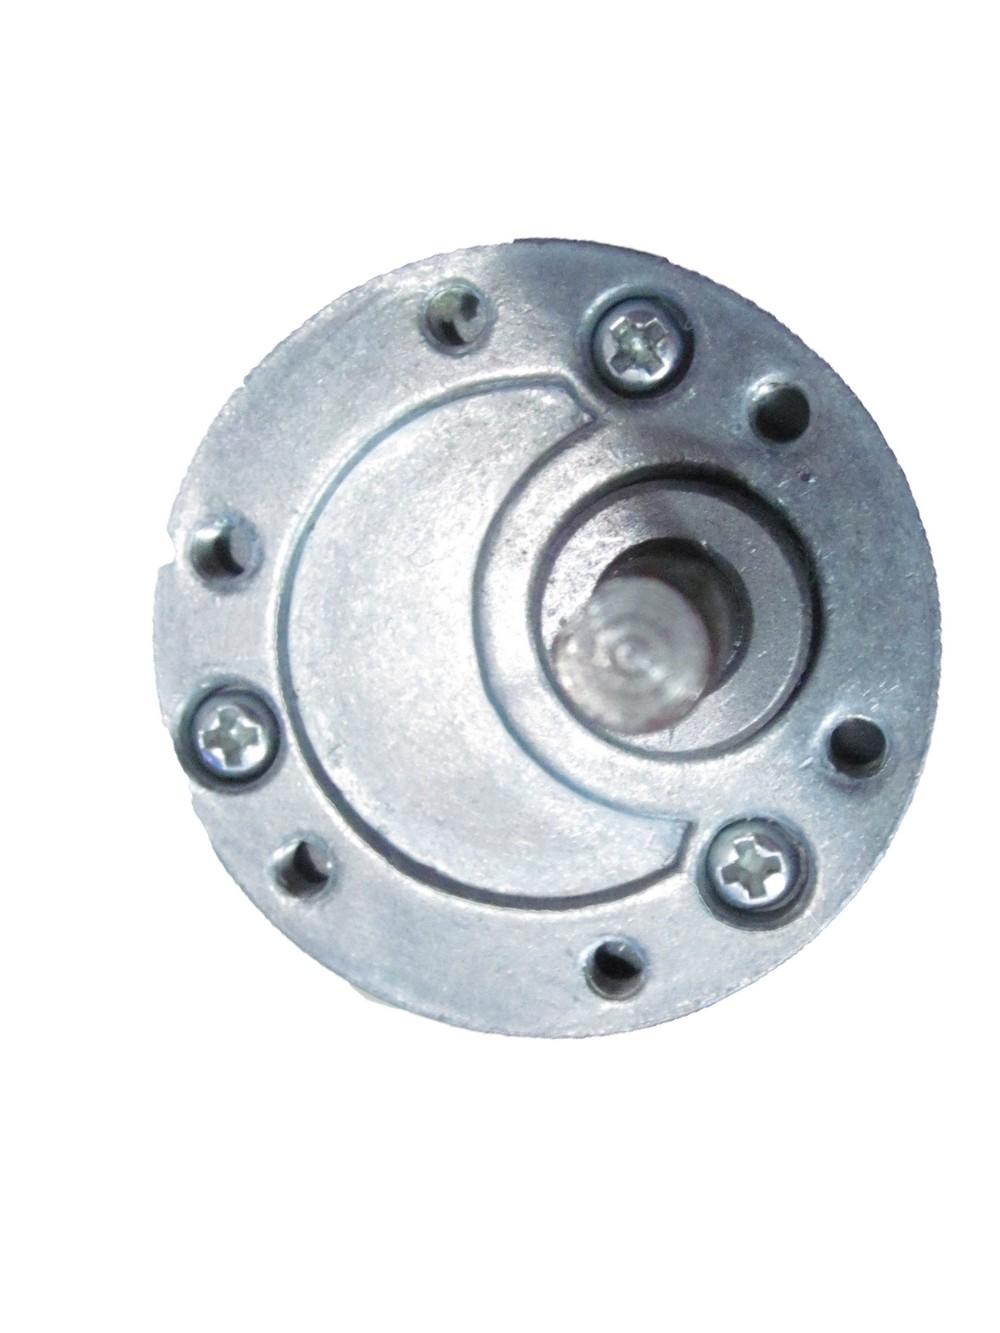 Dayton Gear Reduction Electric Motor